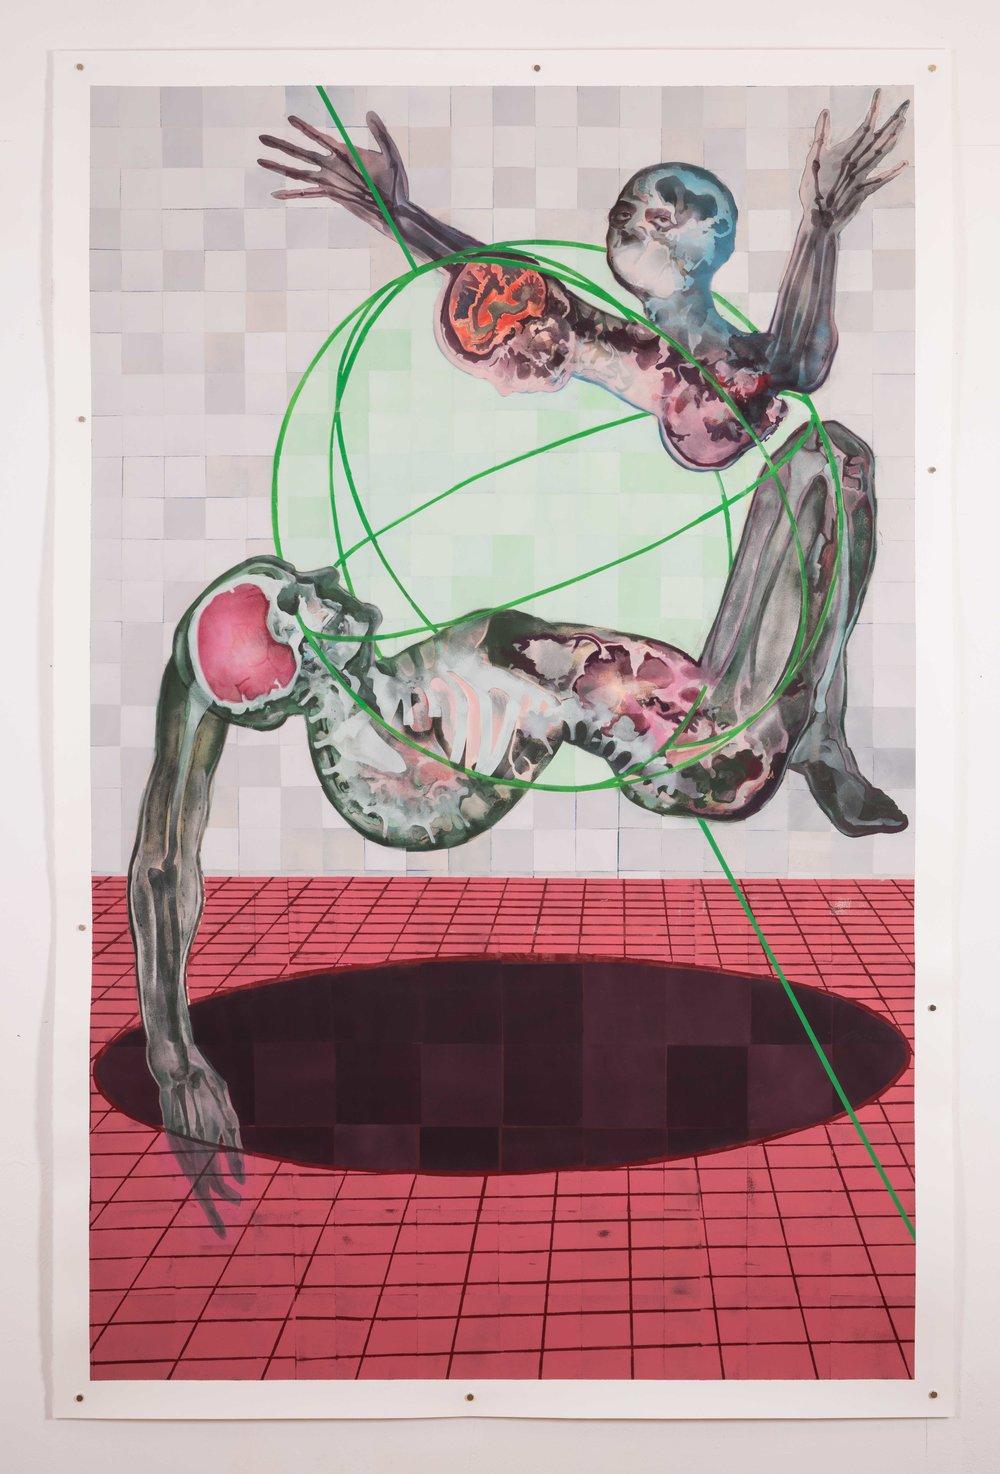 The Metamorphic Humanoid, 2017